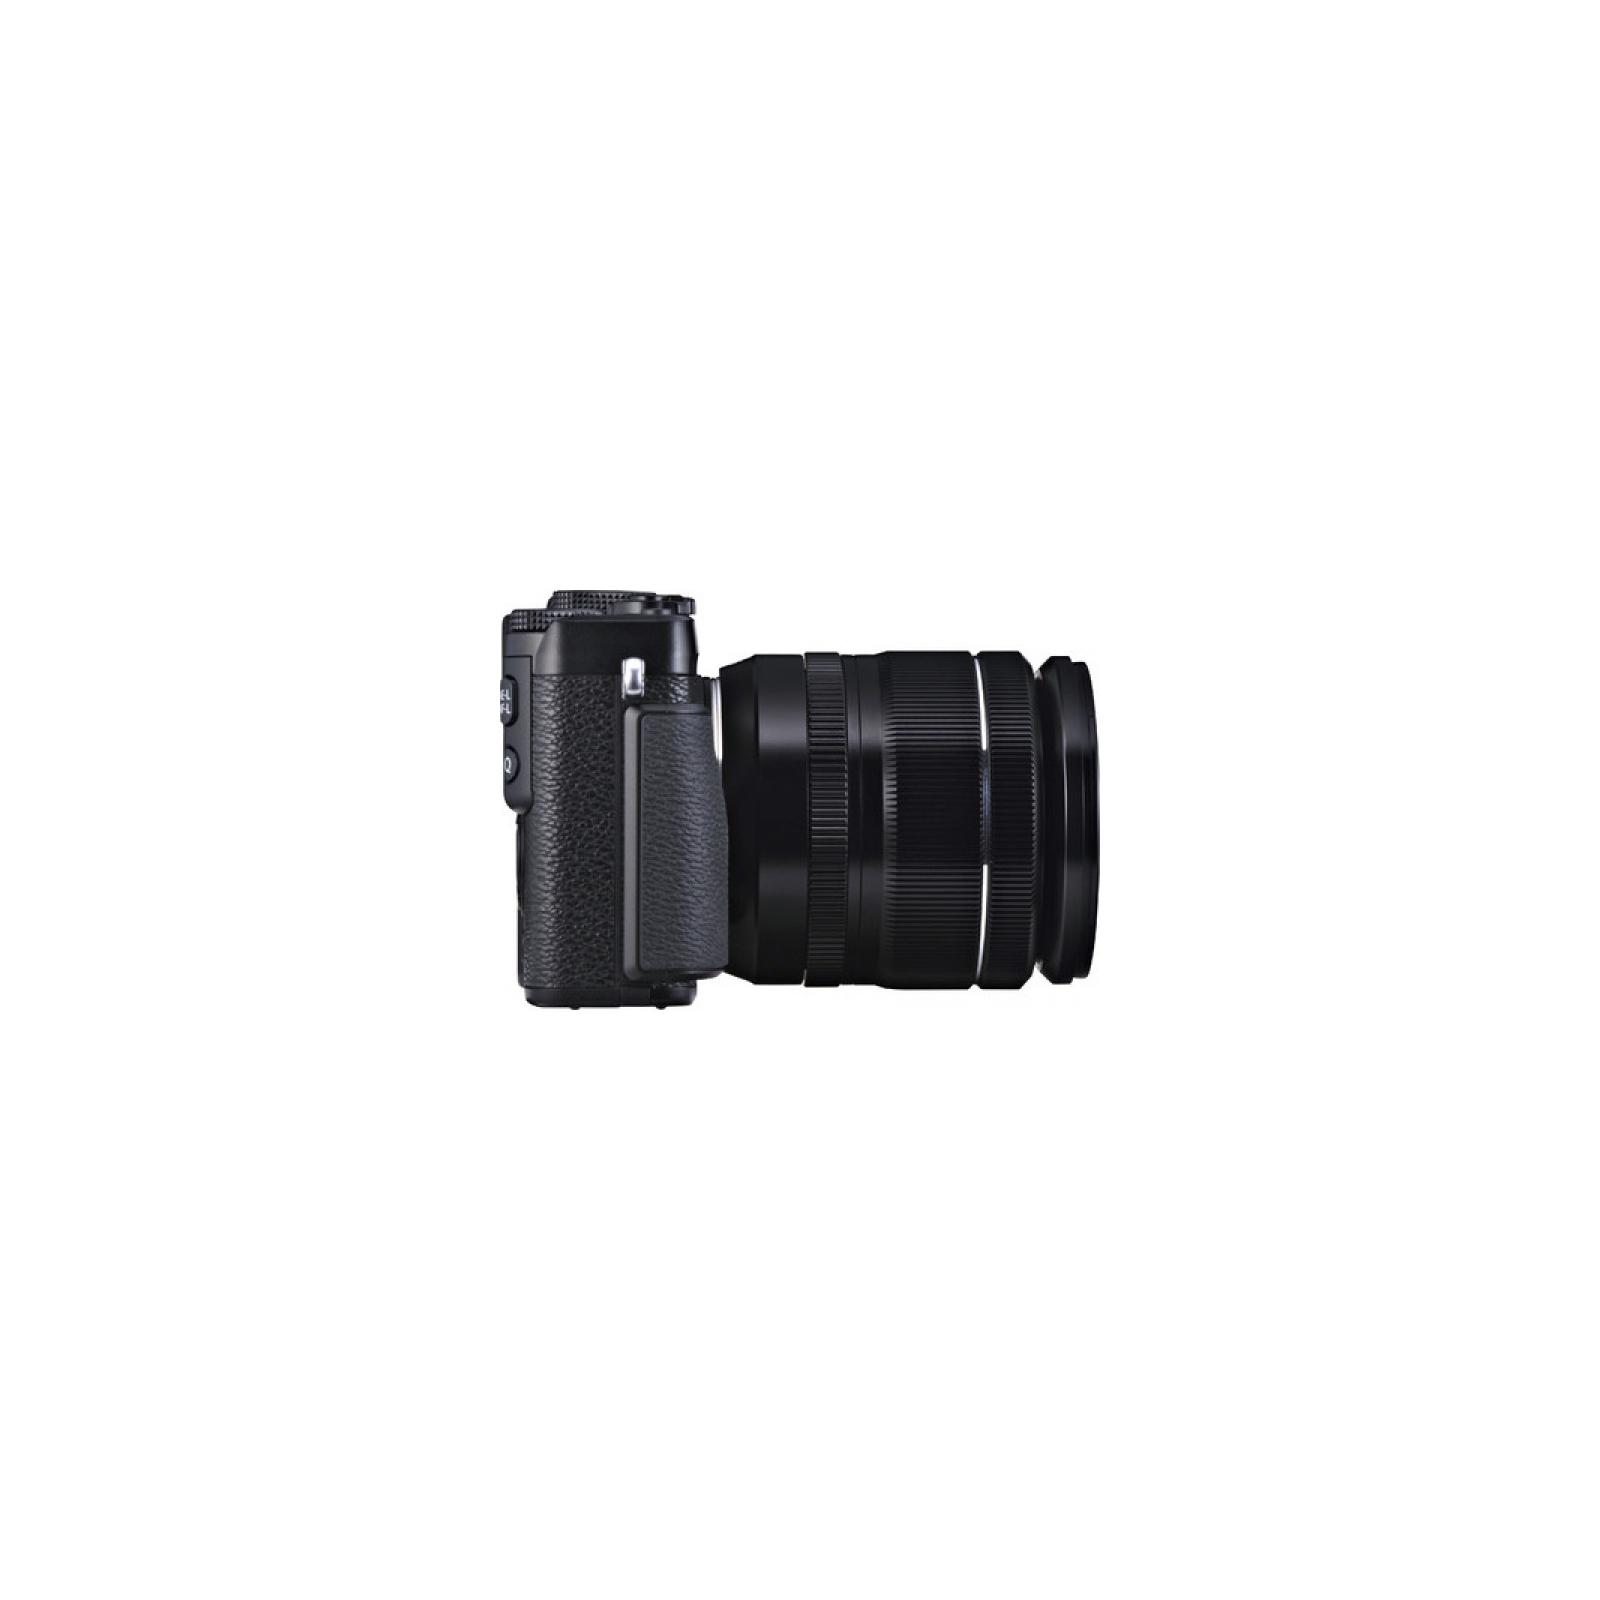 Объектив Fujifilm XF-18-55mm F2.8-4 OIS (16276479) изображение 6